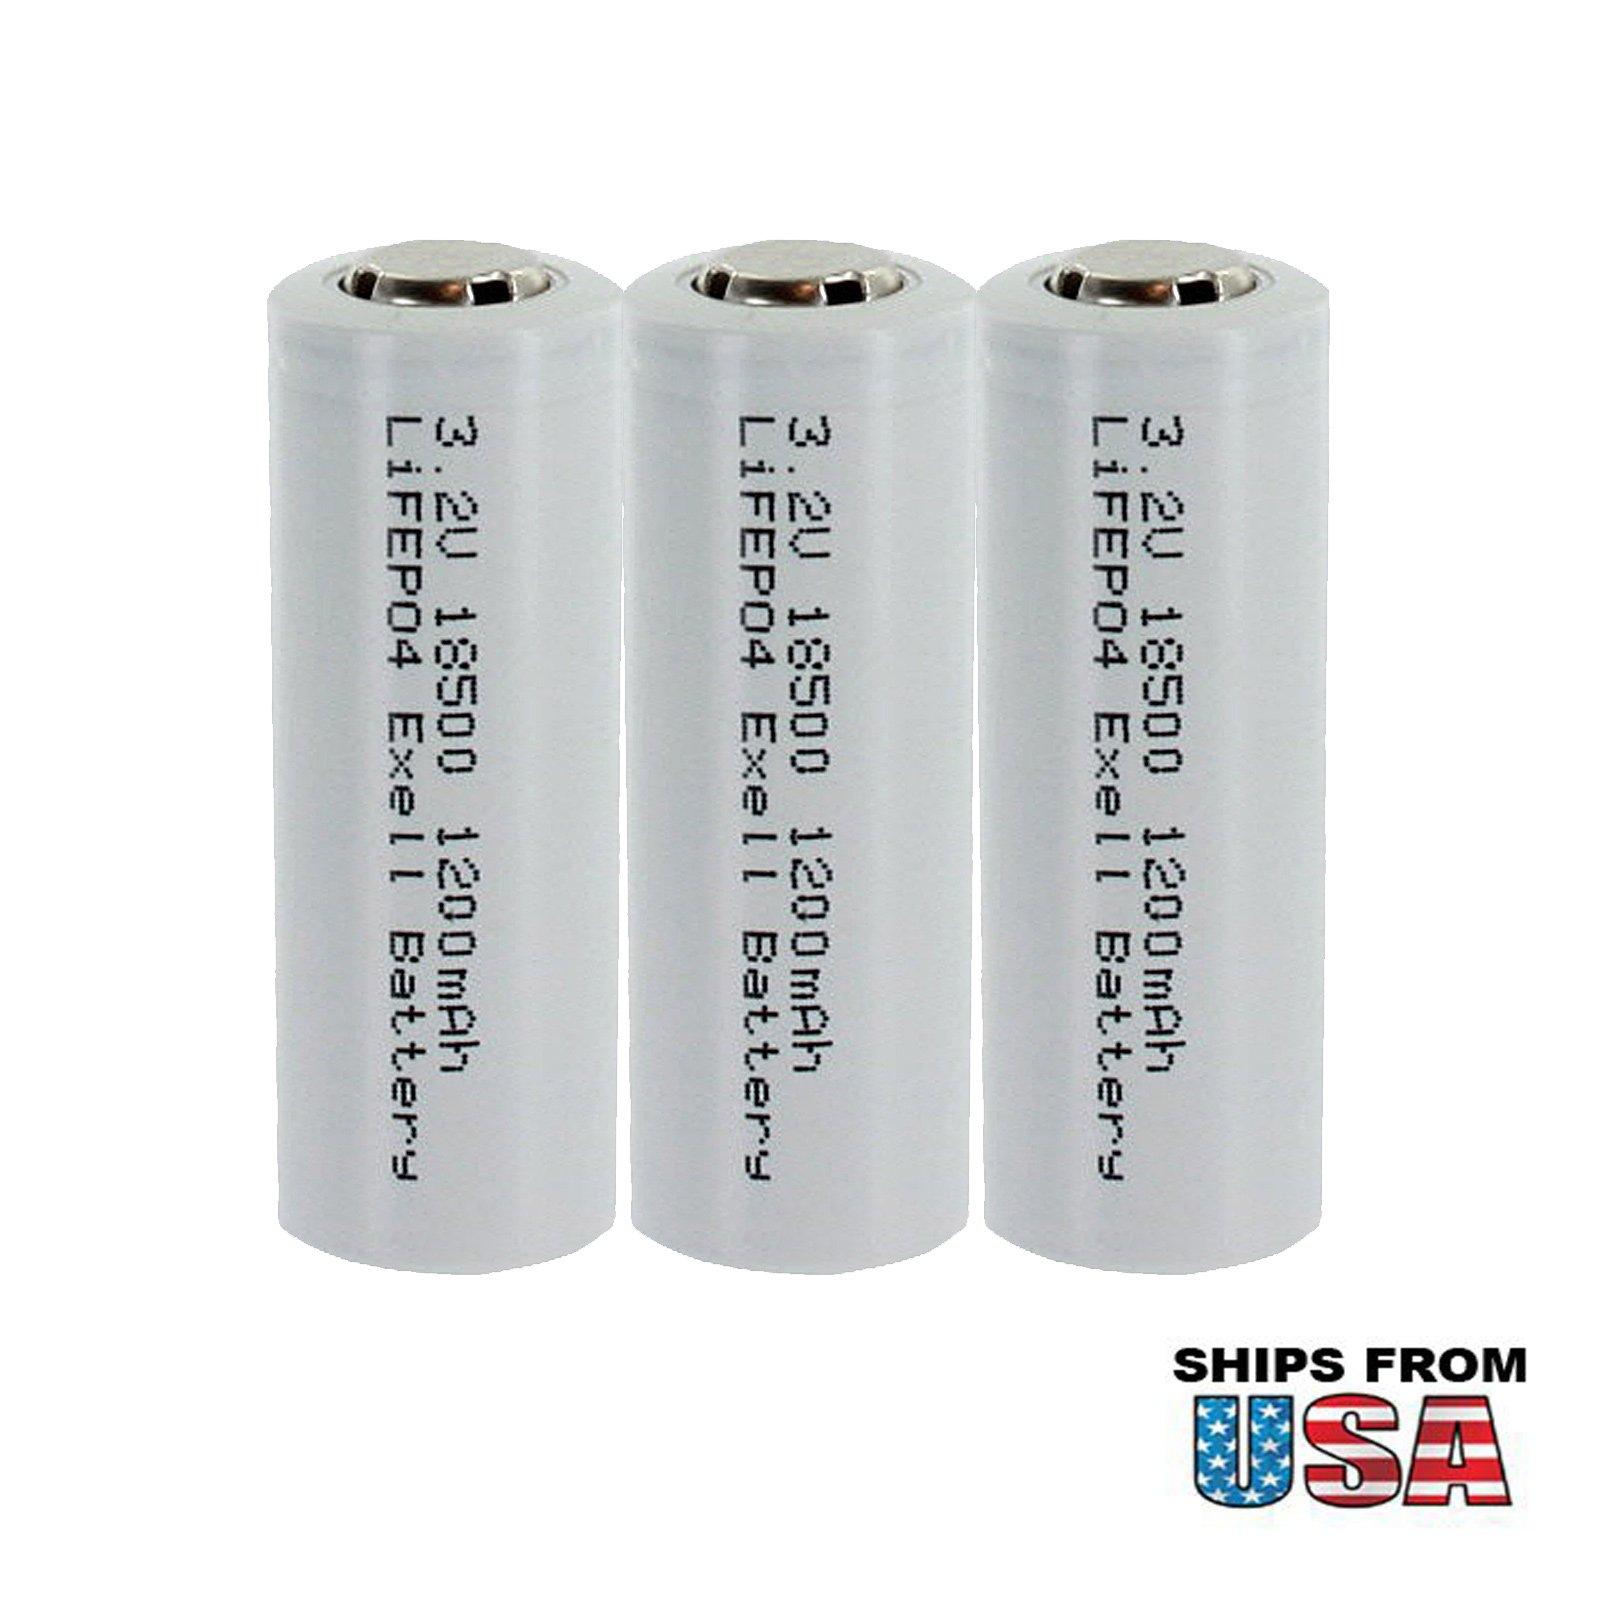 3x Exell LiFePO4 Size 18500 Rechargeable Solar Battery 3.2V 1200mAh USA SHIP